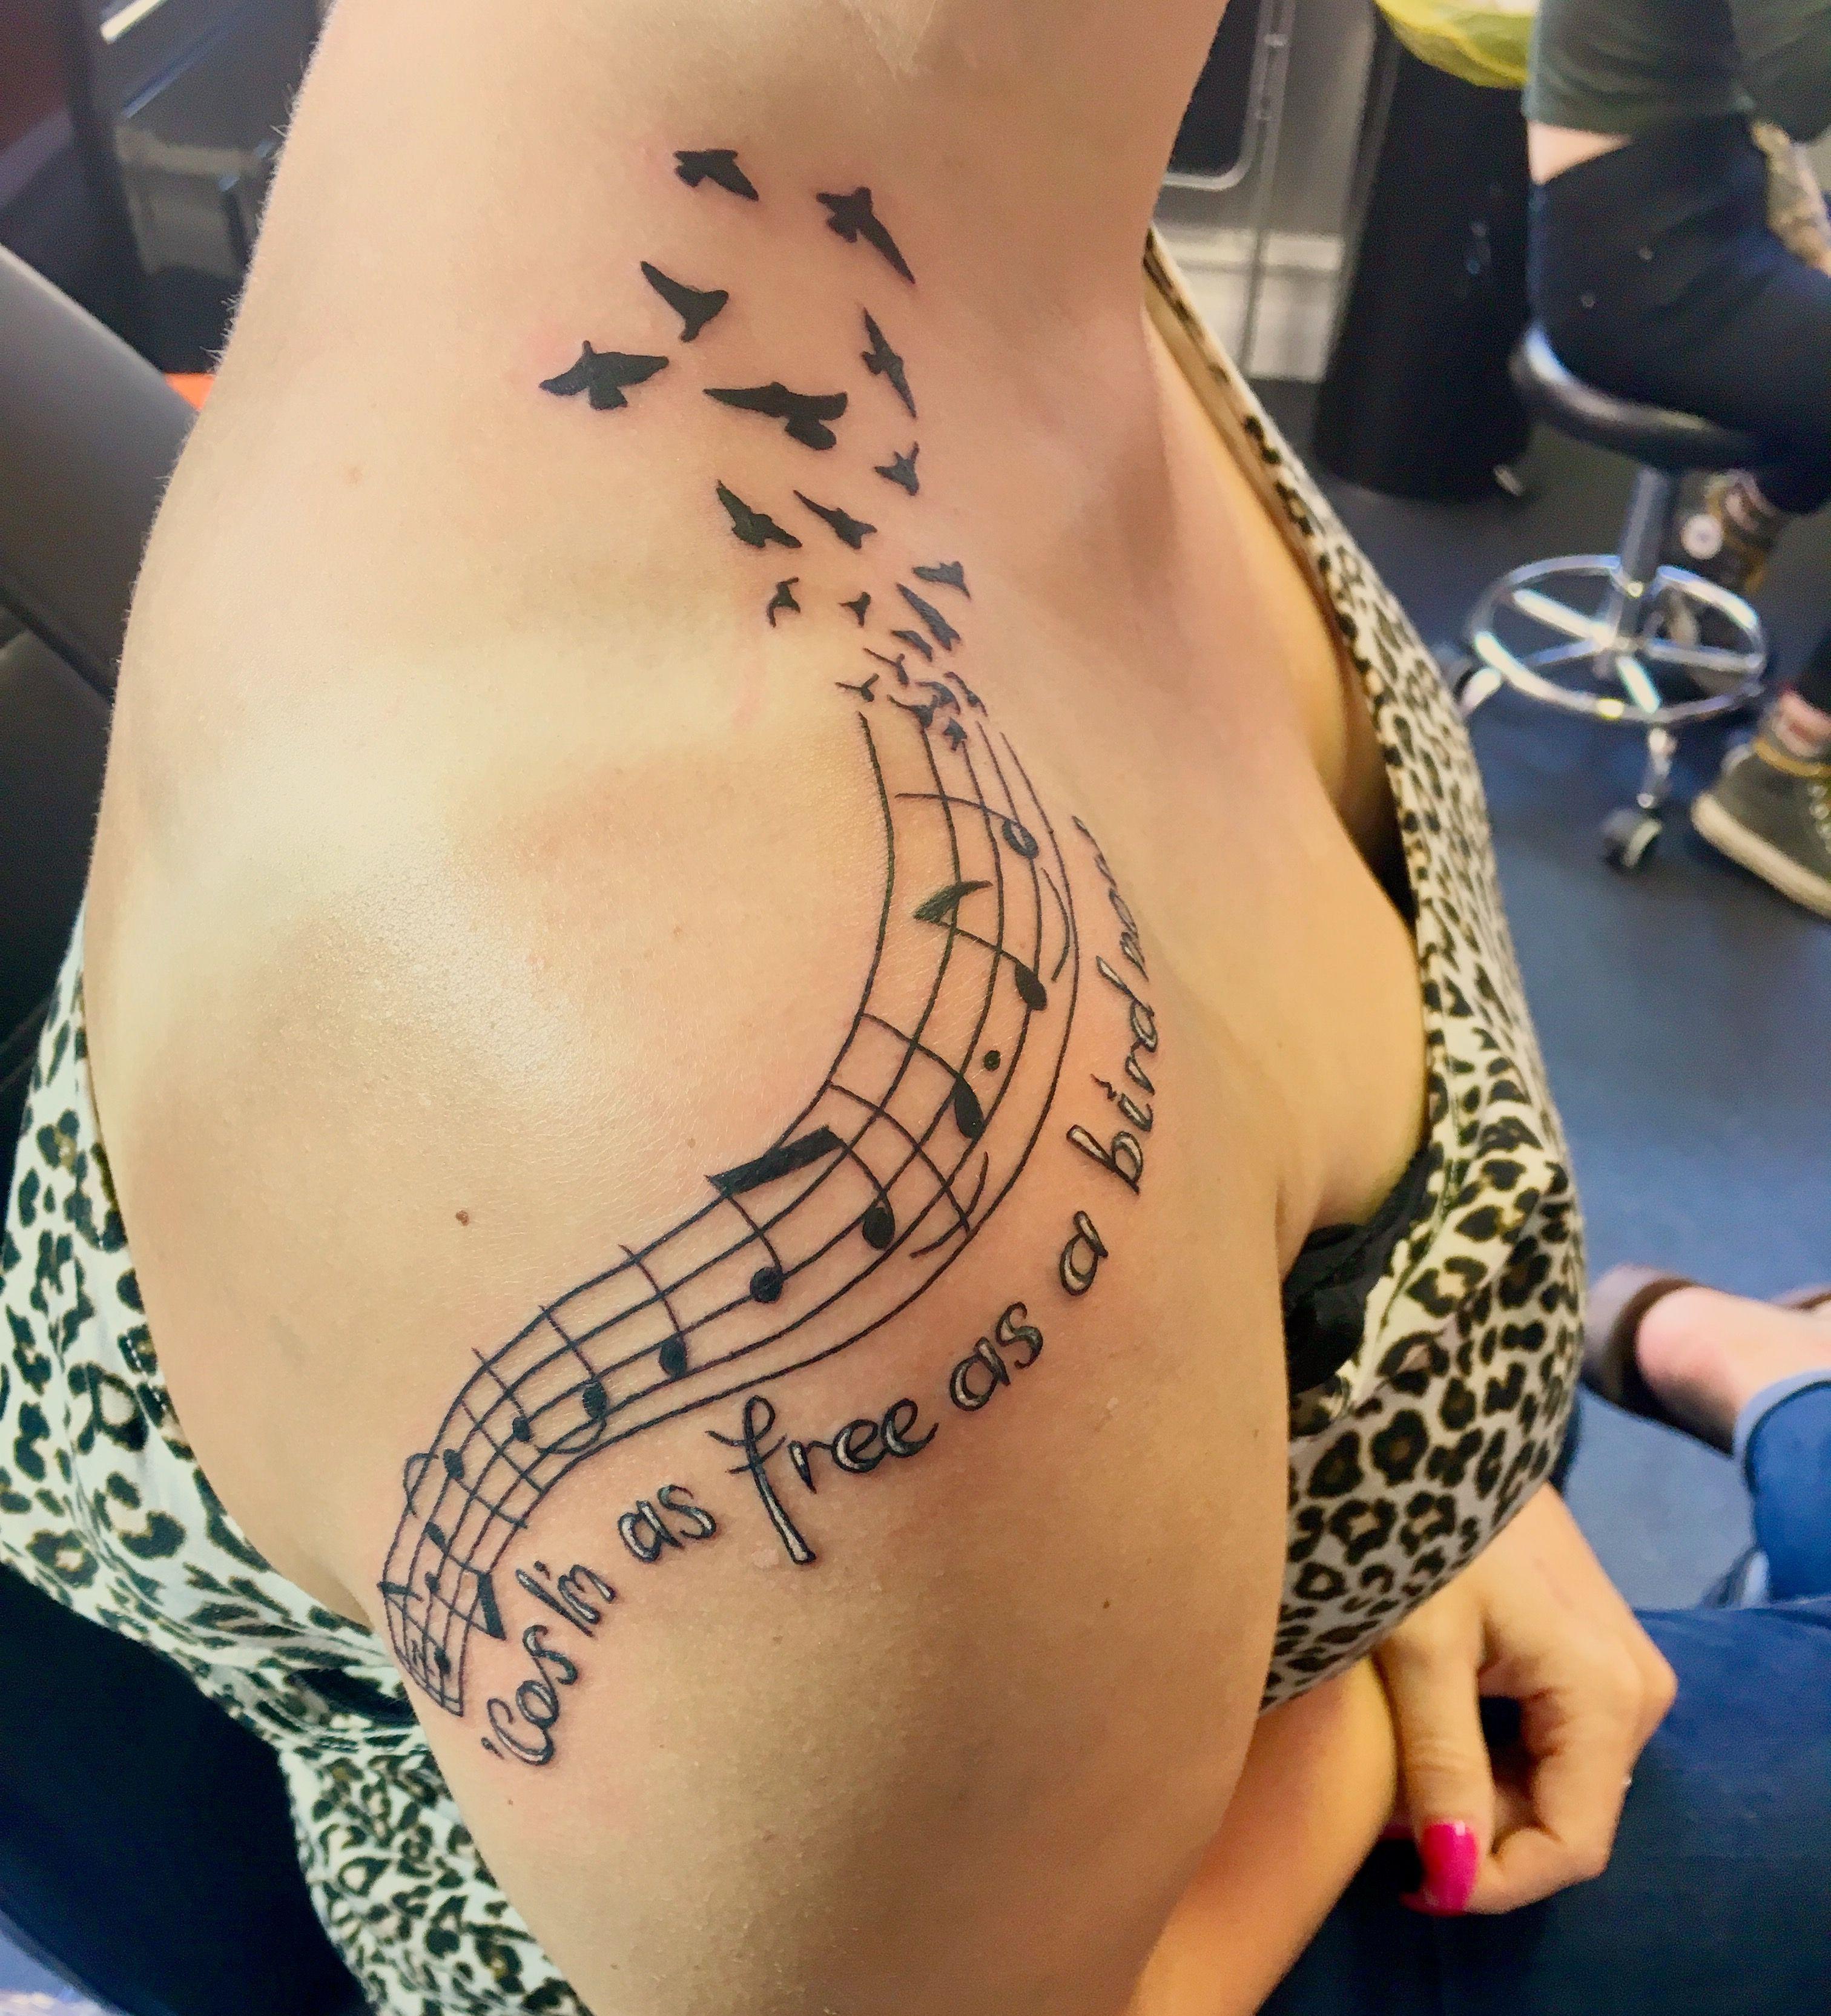 freebird by lynyrd skynyrd is my favourite song tattoo done by adam